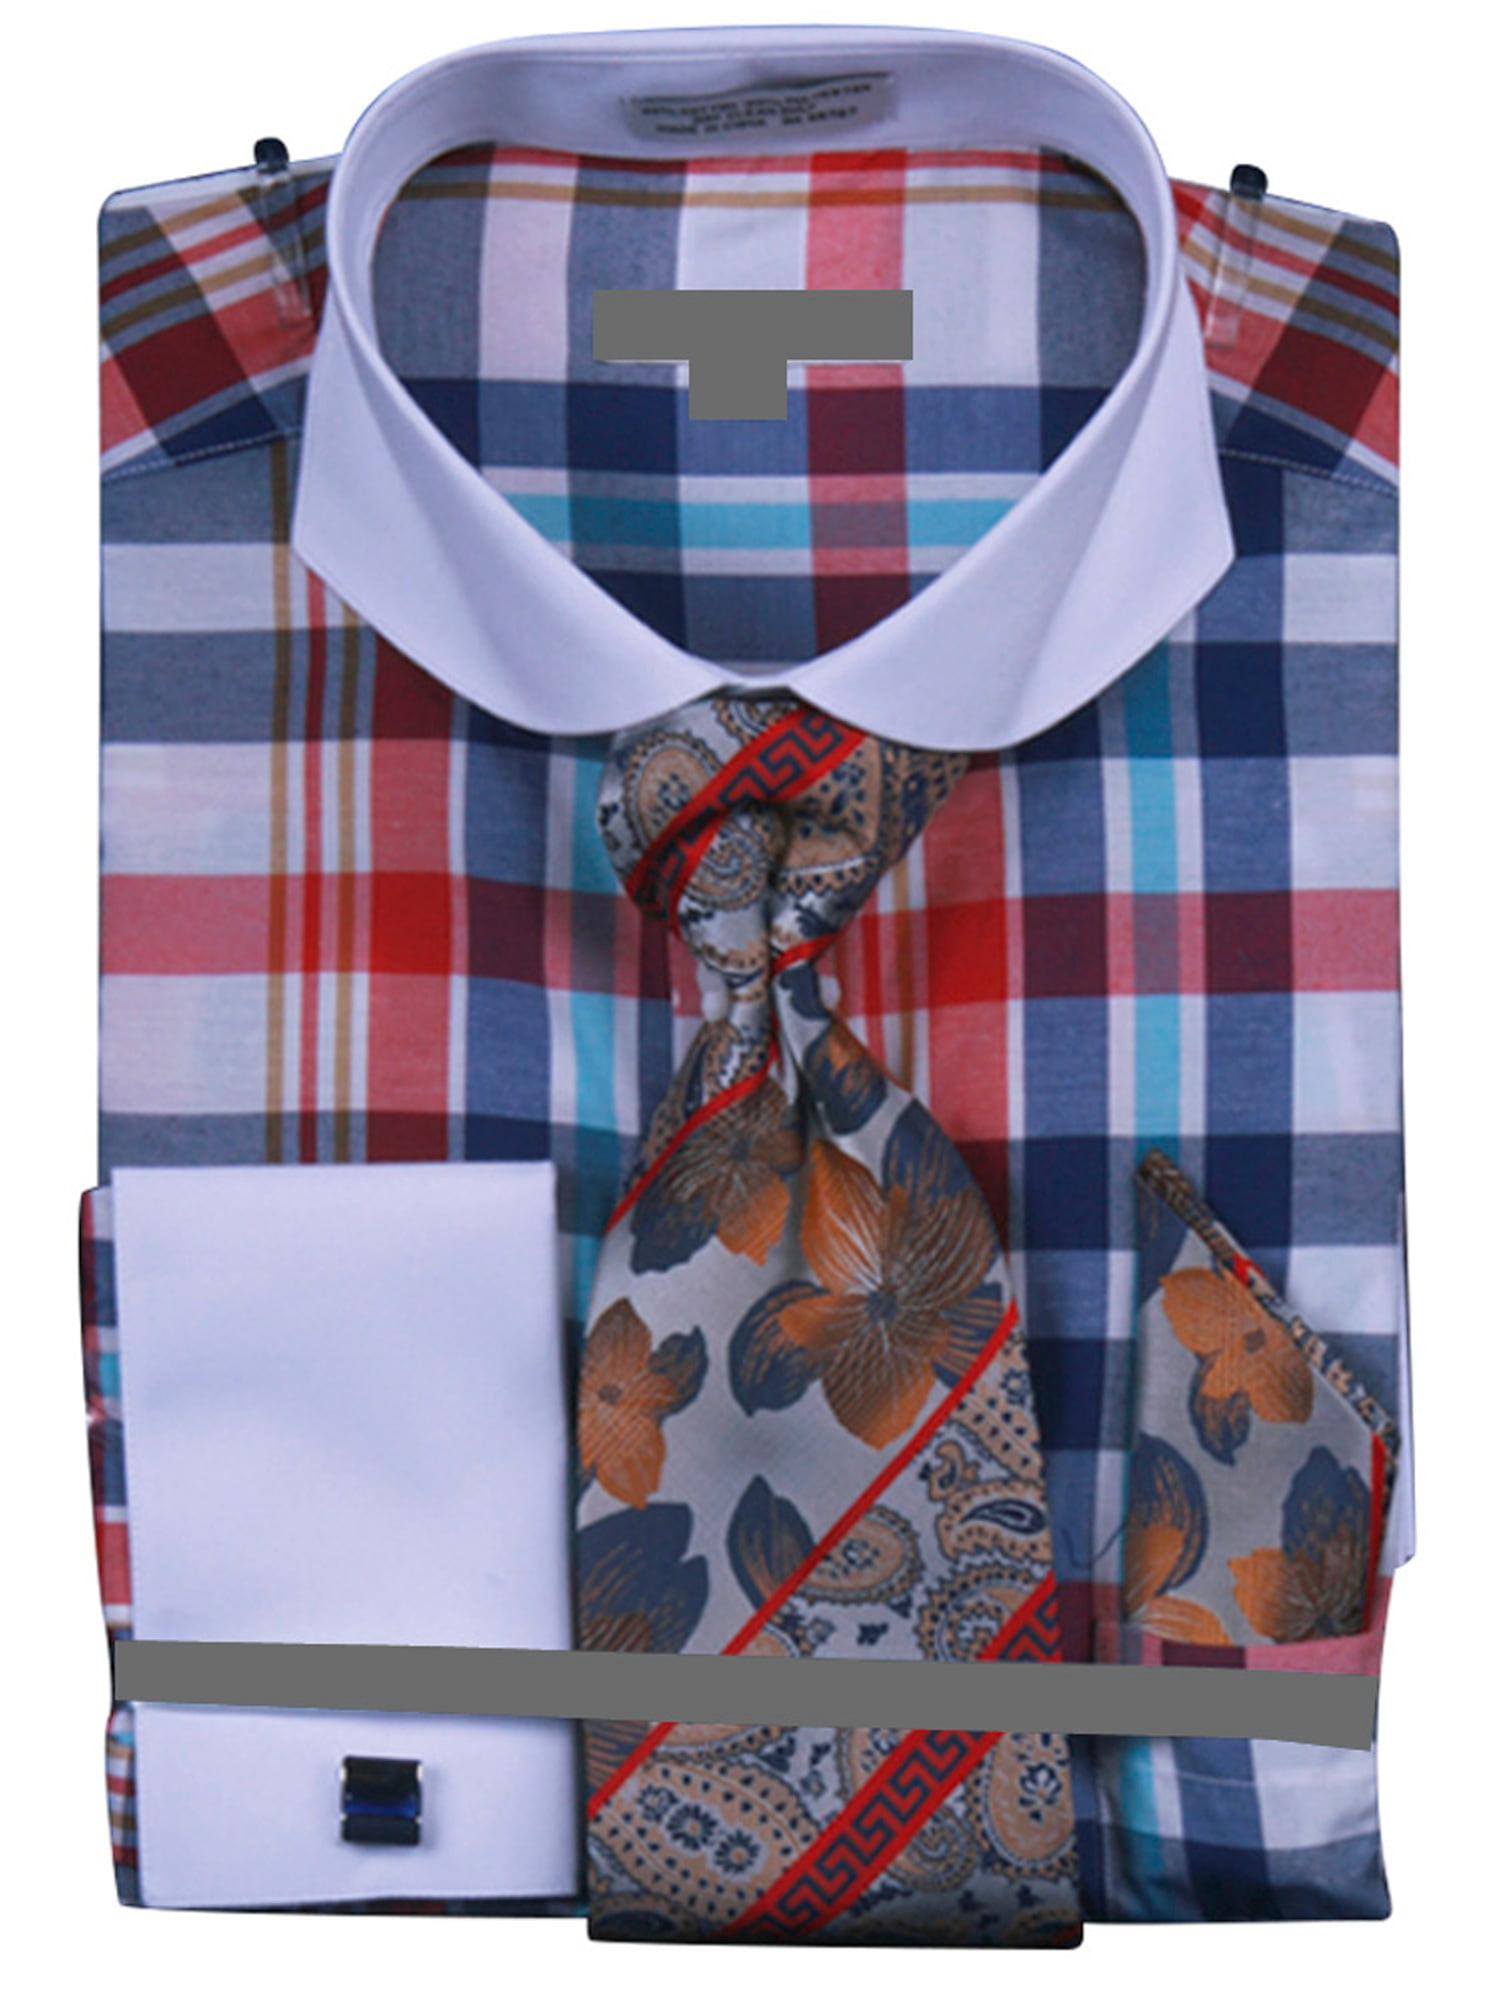 men's multi checker french cuff dress shirt tie hanky cufflinks